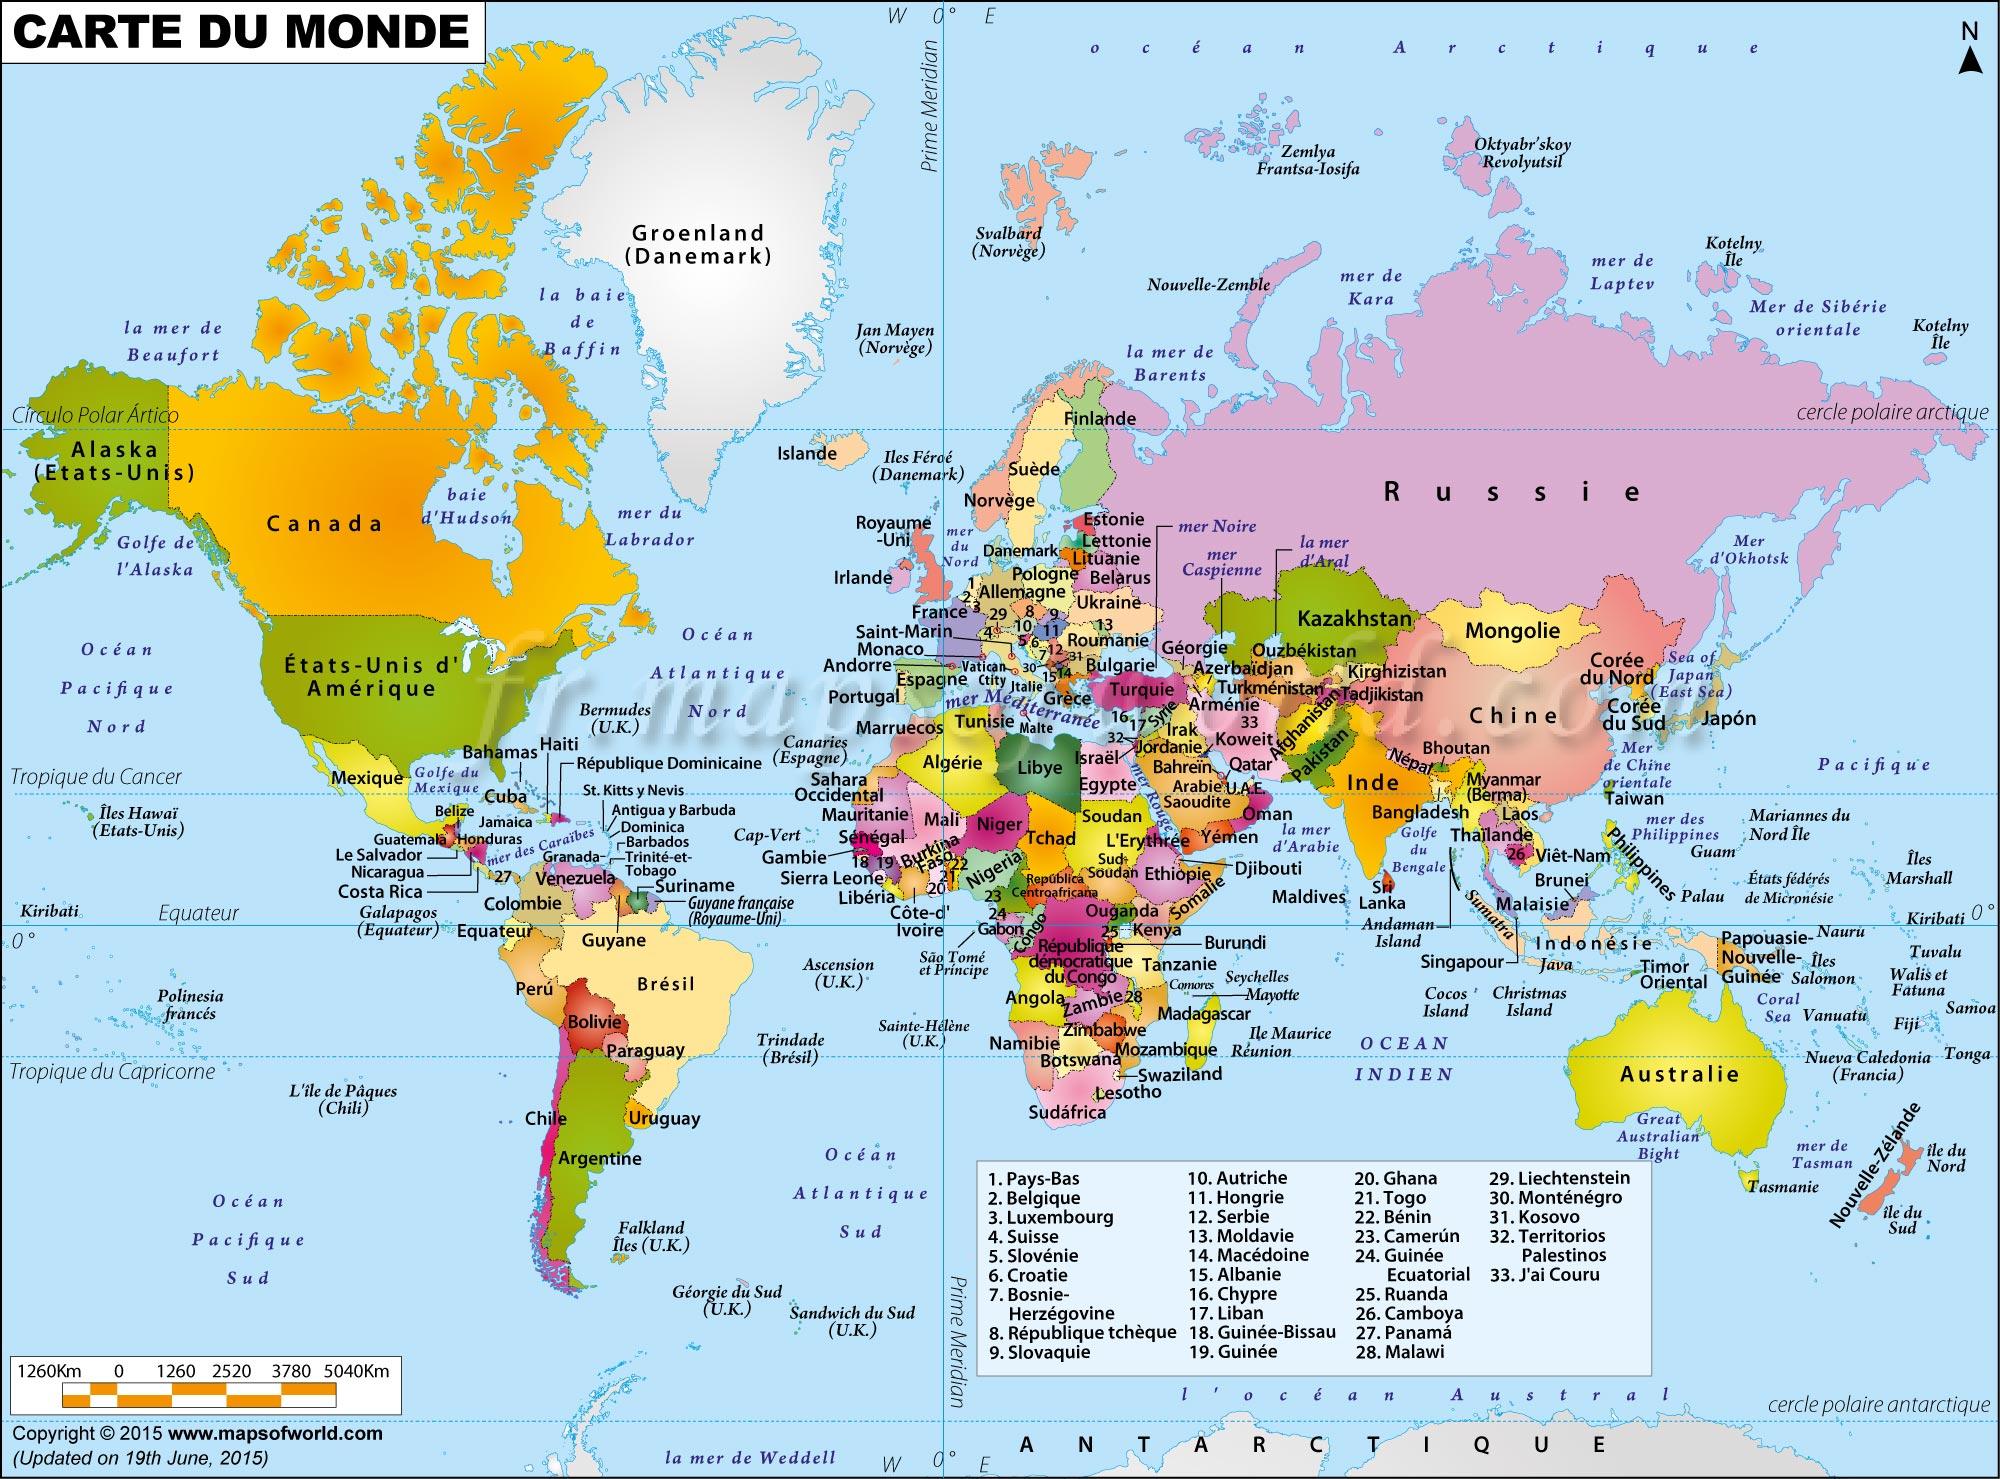 Avion, Ovni et Luxembourg… - Page 2 Grande-carte-du-monde